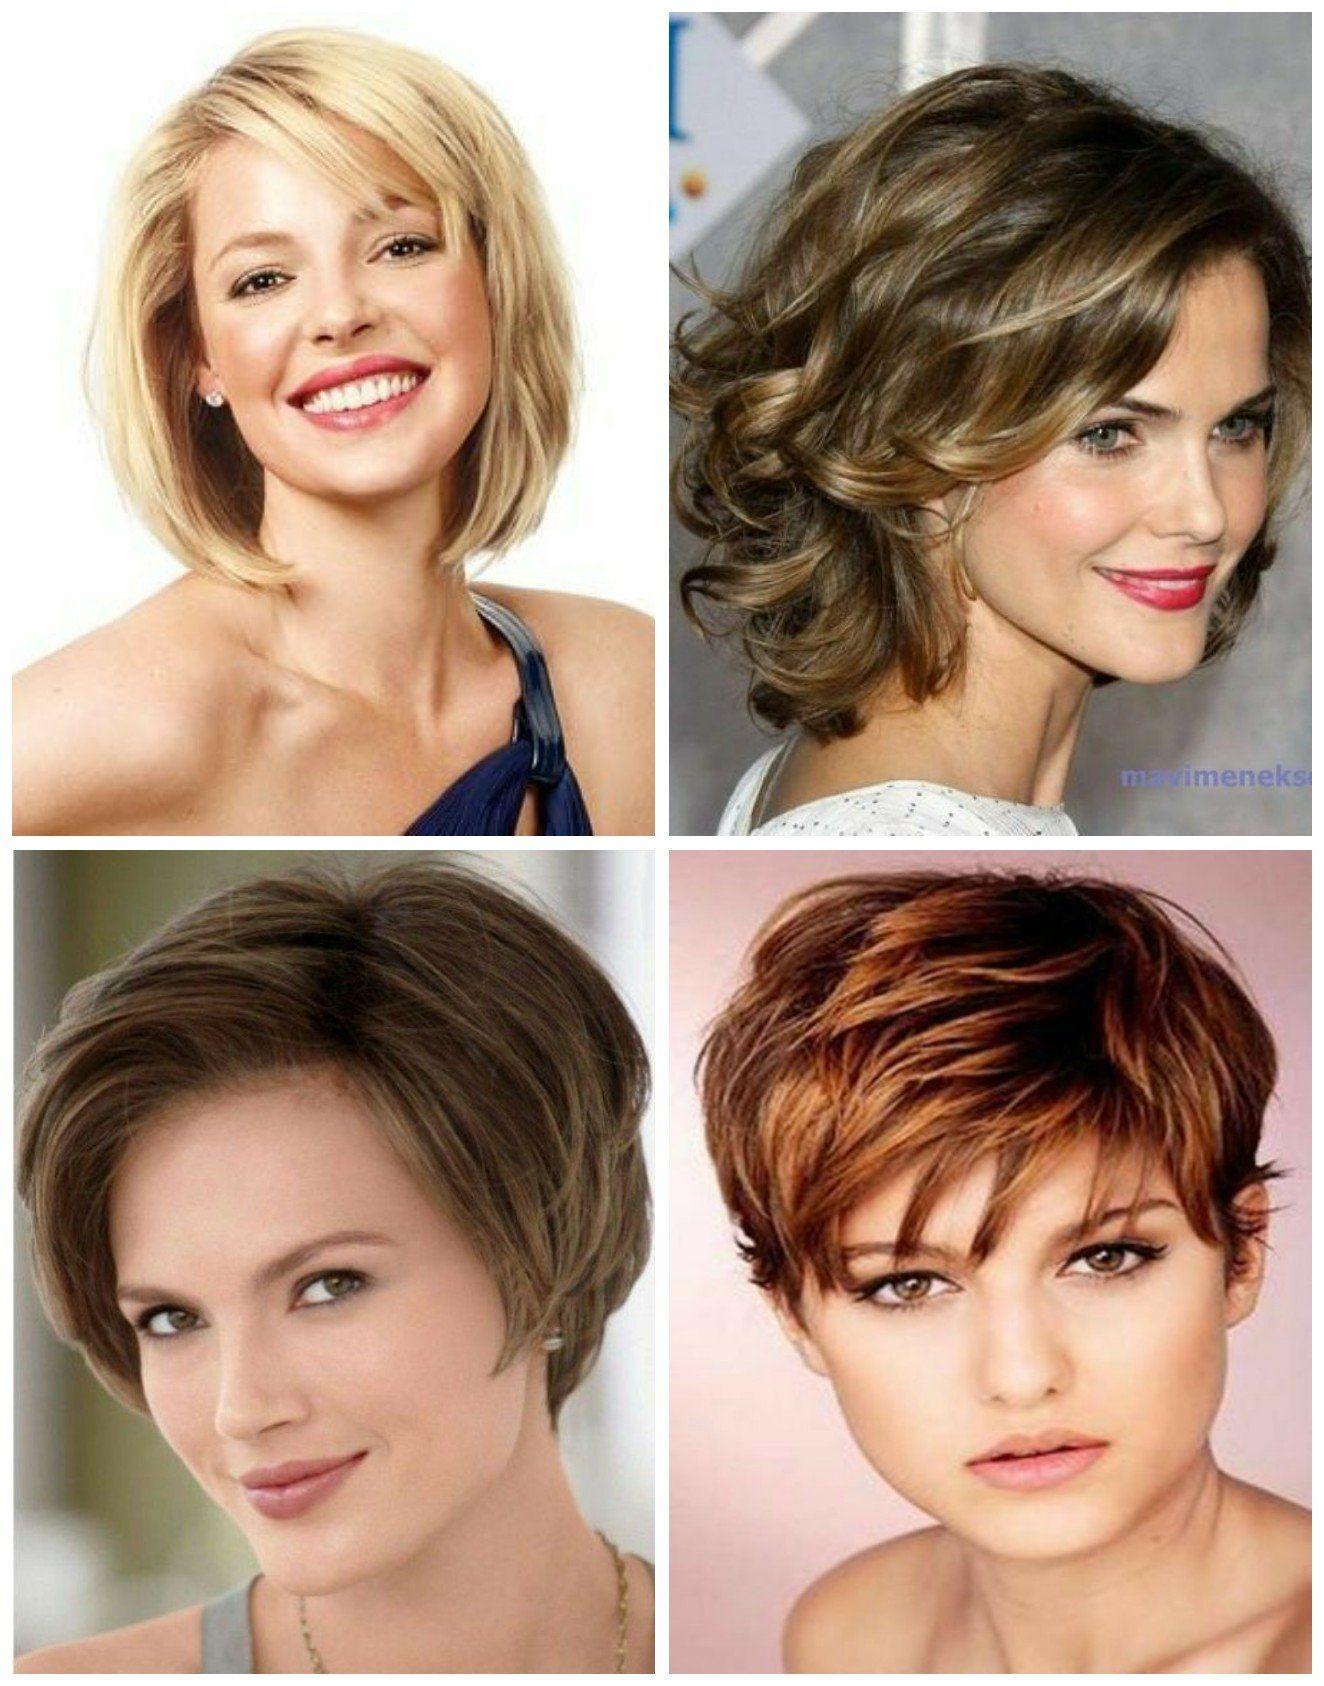 2019 Bayan Kisa Sac Kesim Modelleri Guzel Sozler Hairstyle Examples Hair Growth Women Hair Pieces